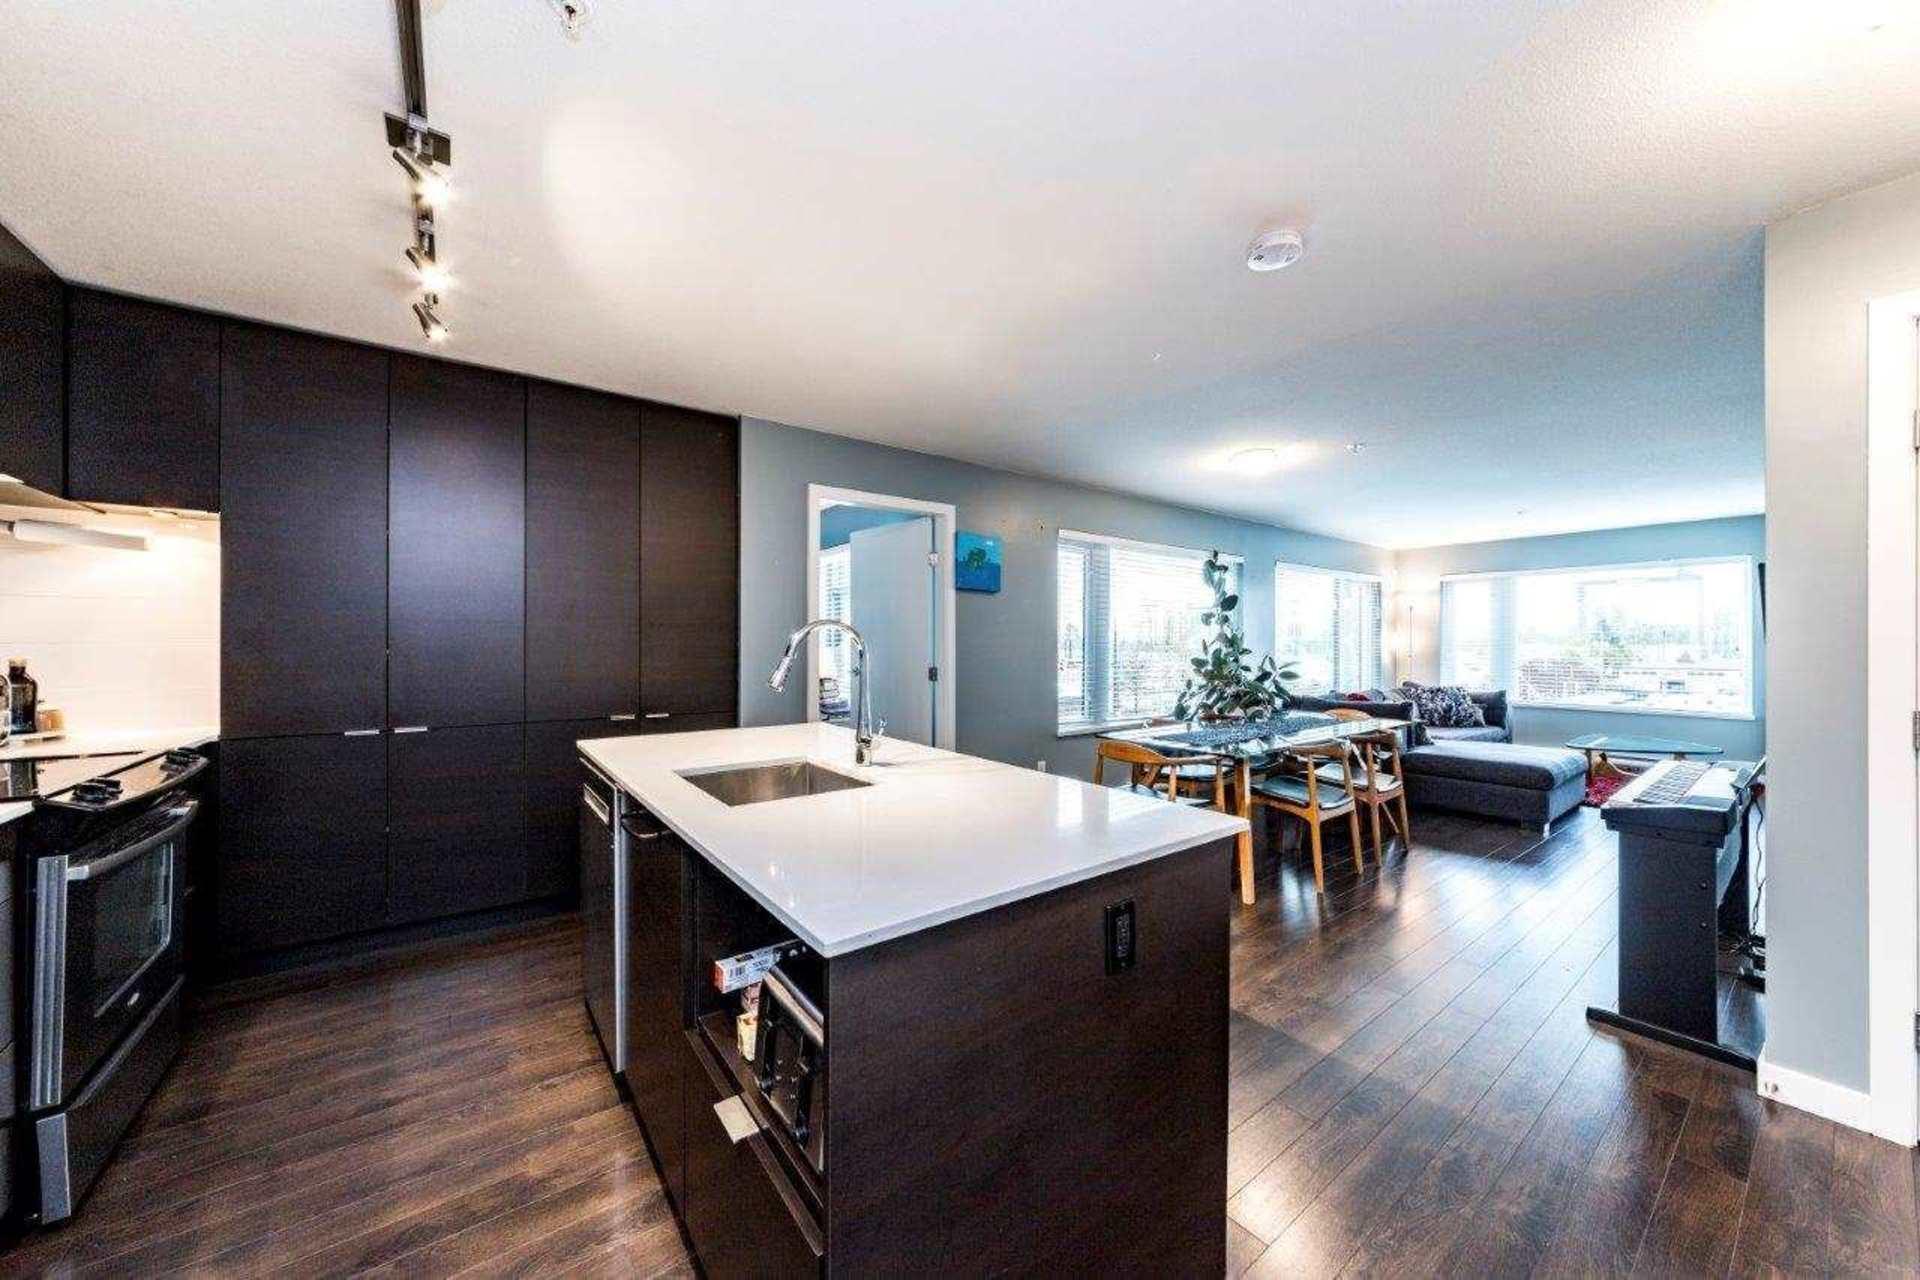 1673-lloyd-avenue-pemberton-nv-north-vancouver-01 at 307 - 1673 Lloyd Avenue, Pemberton NV, North Vancouver